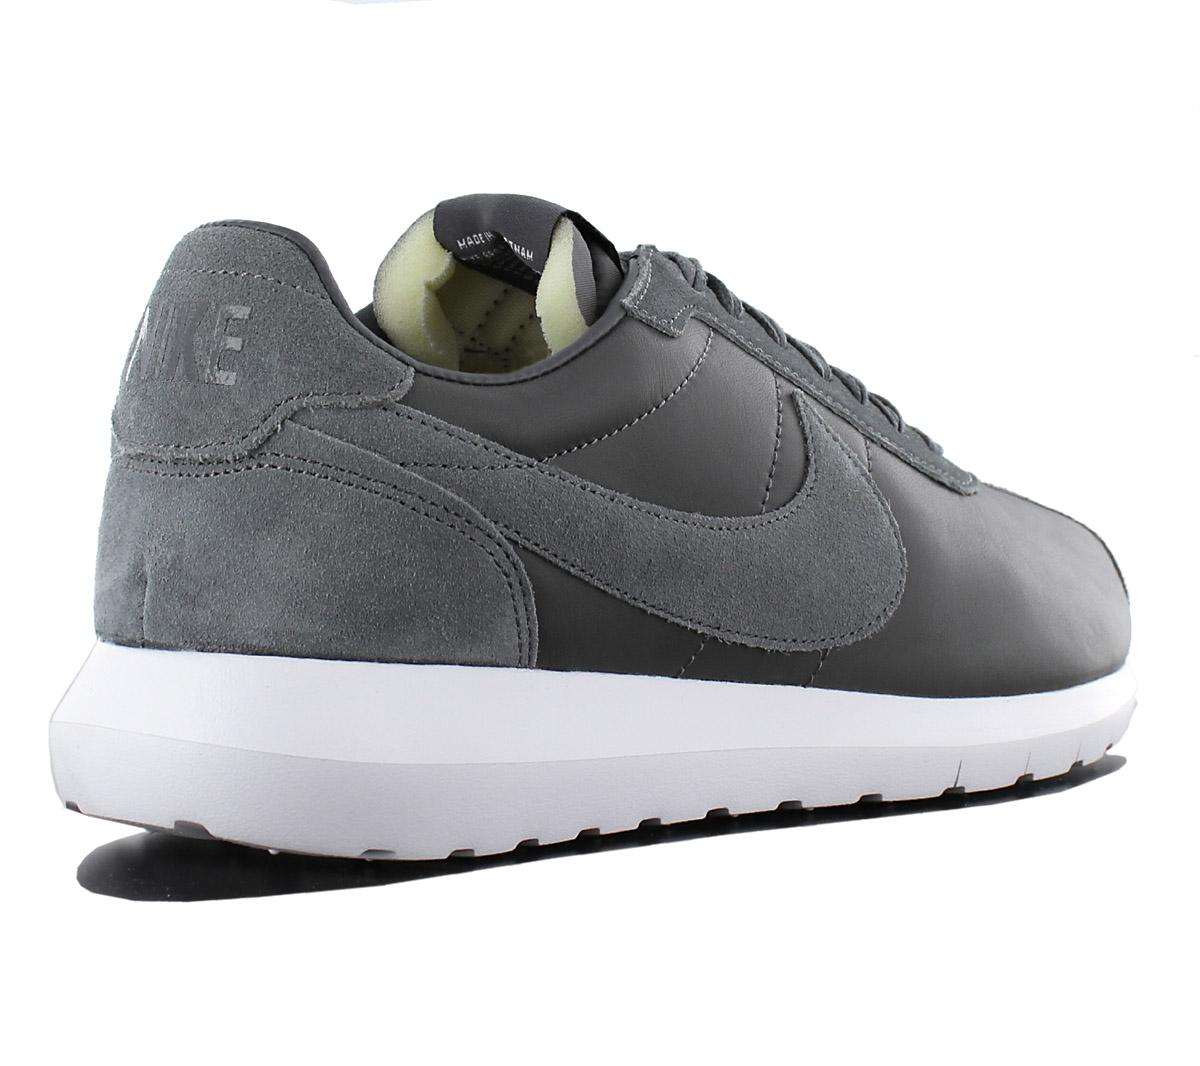 0877bf325a37 Nike Roshe LD-1000 Premium Qs Quickstrike Release Men s Sneakers ...